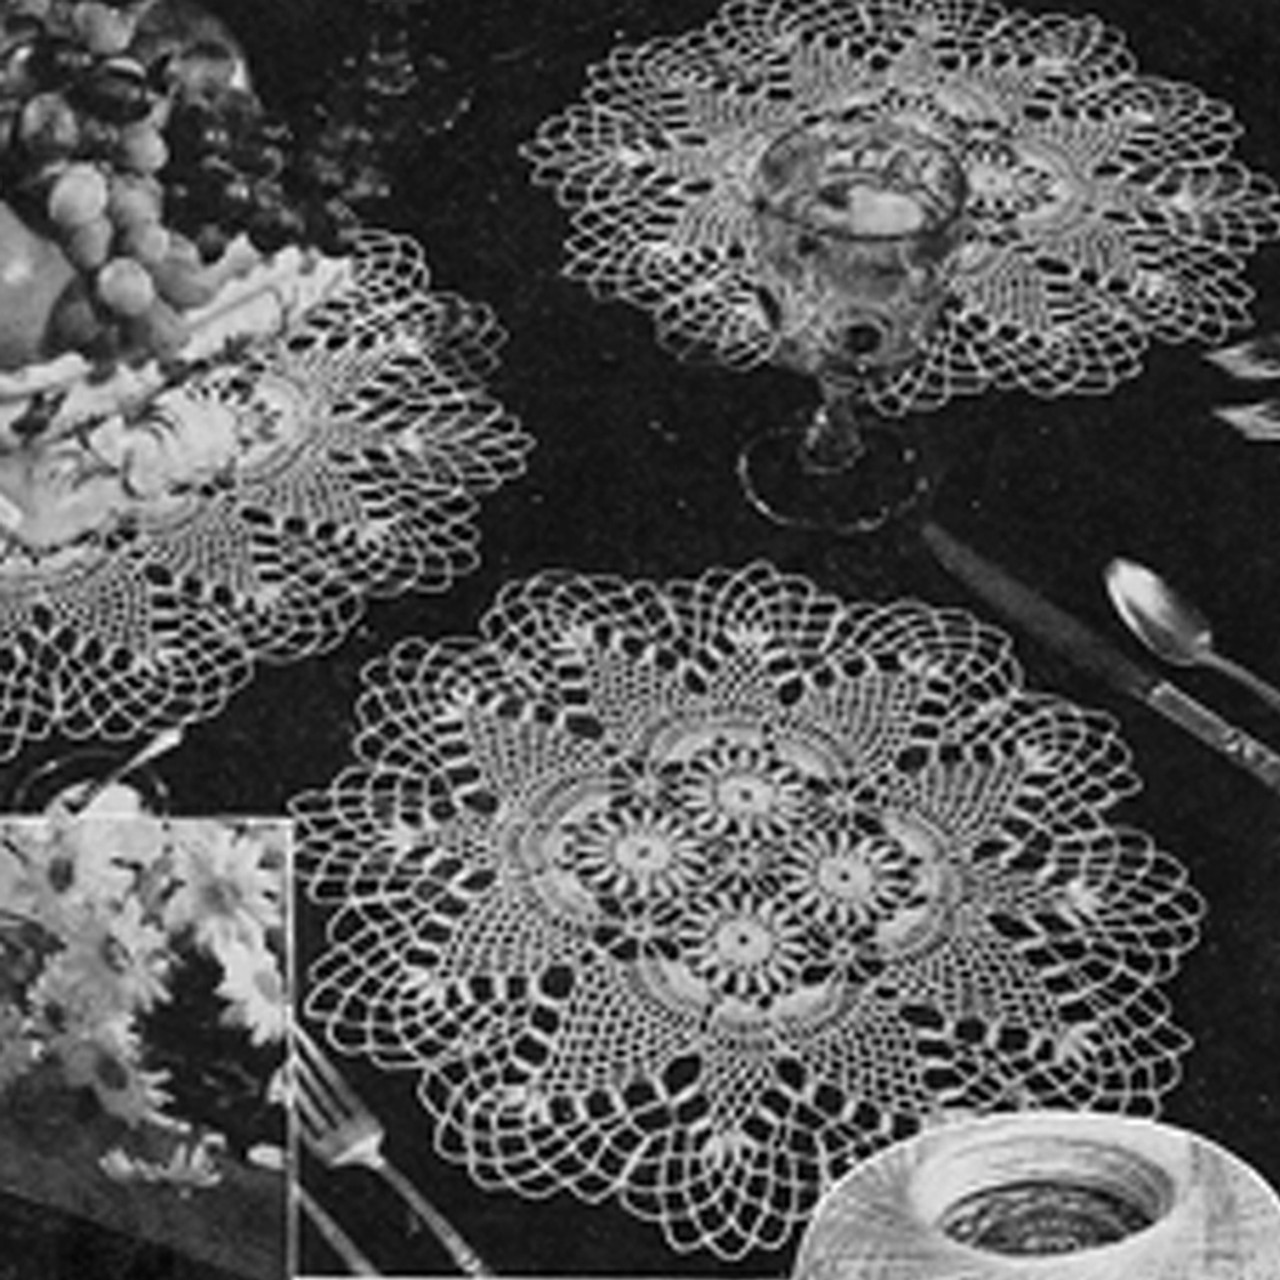 Crocheted Pineapple Place Mats Pattern